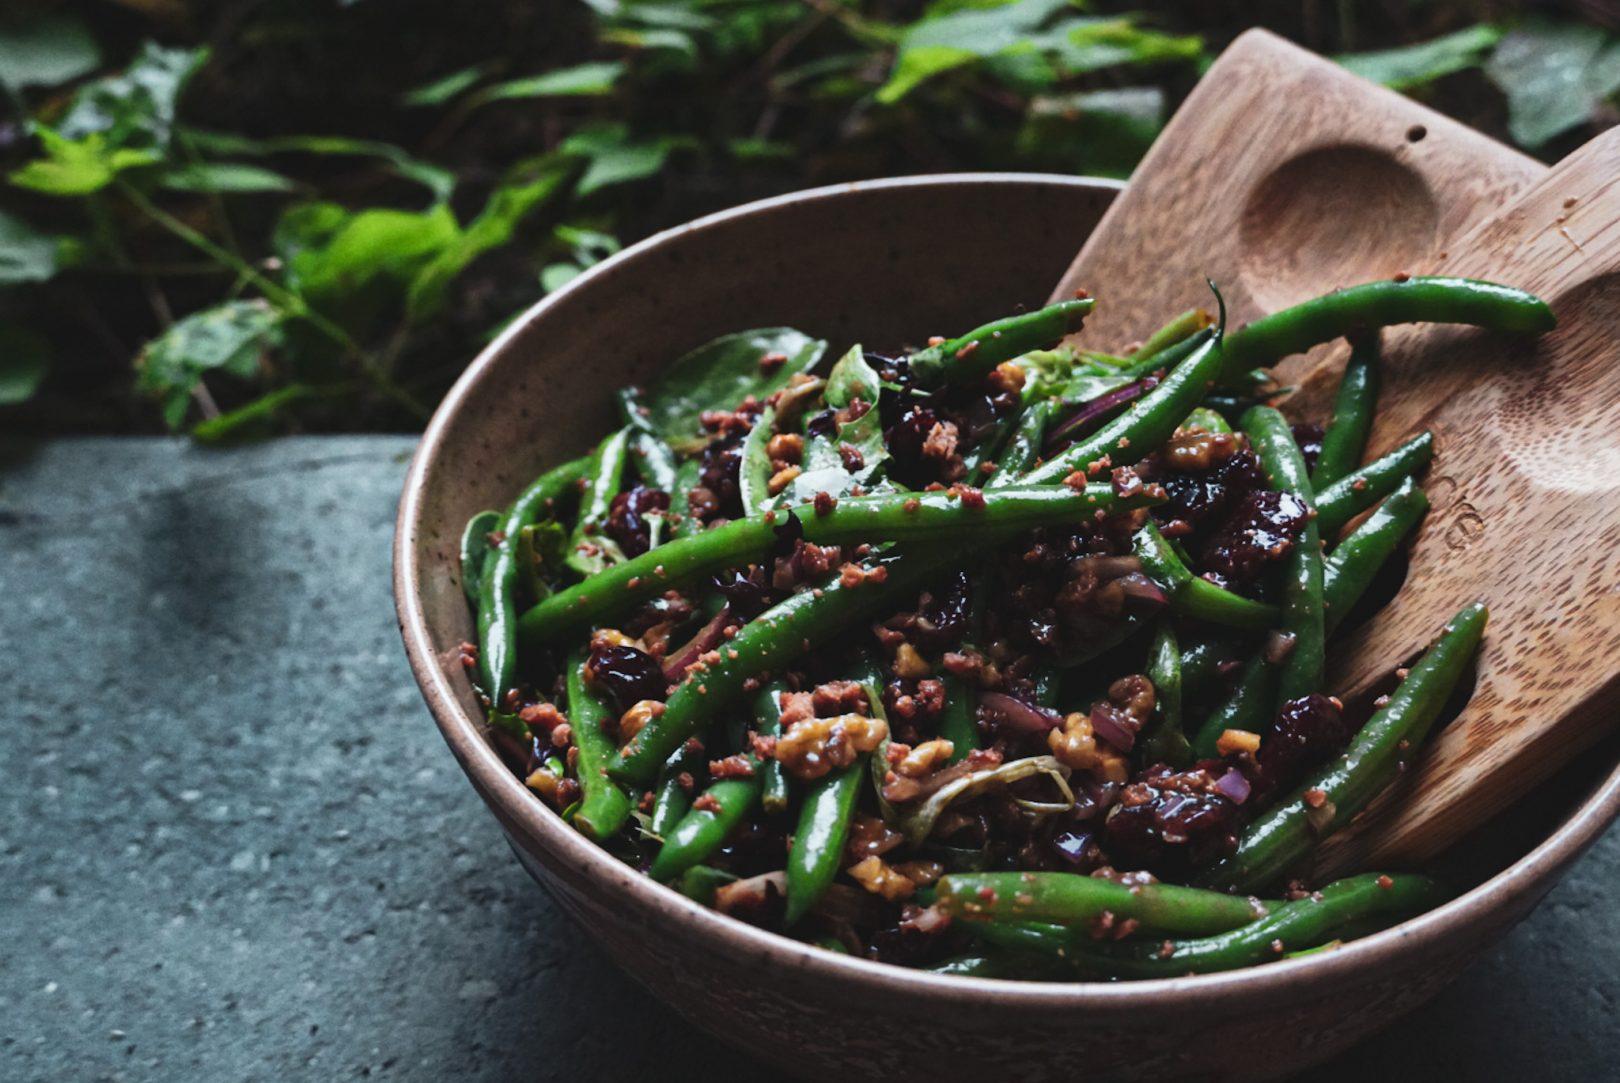 Salade d'haricots verts et bacon